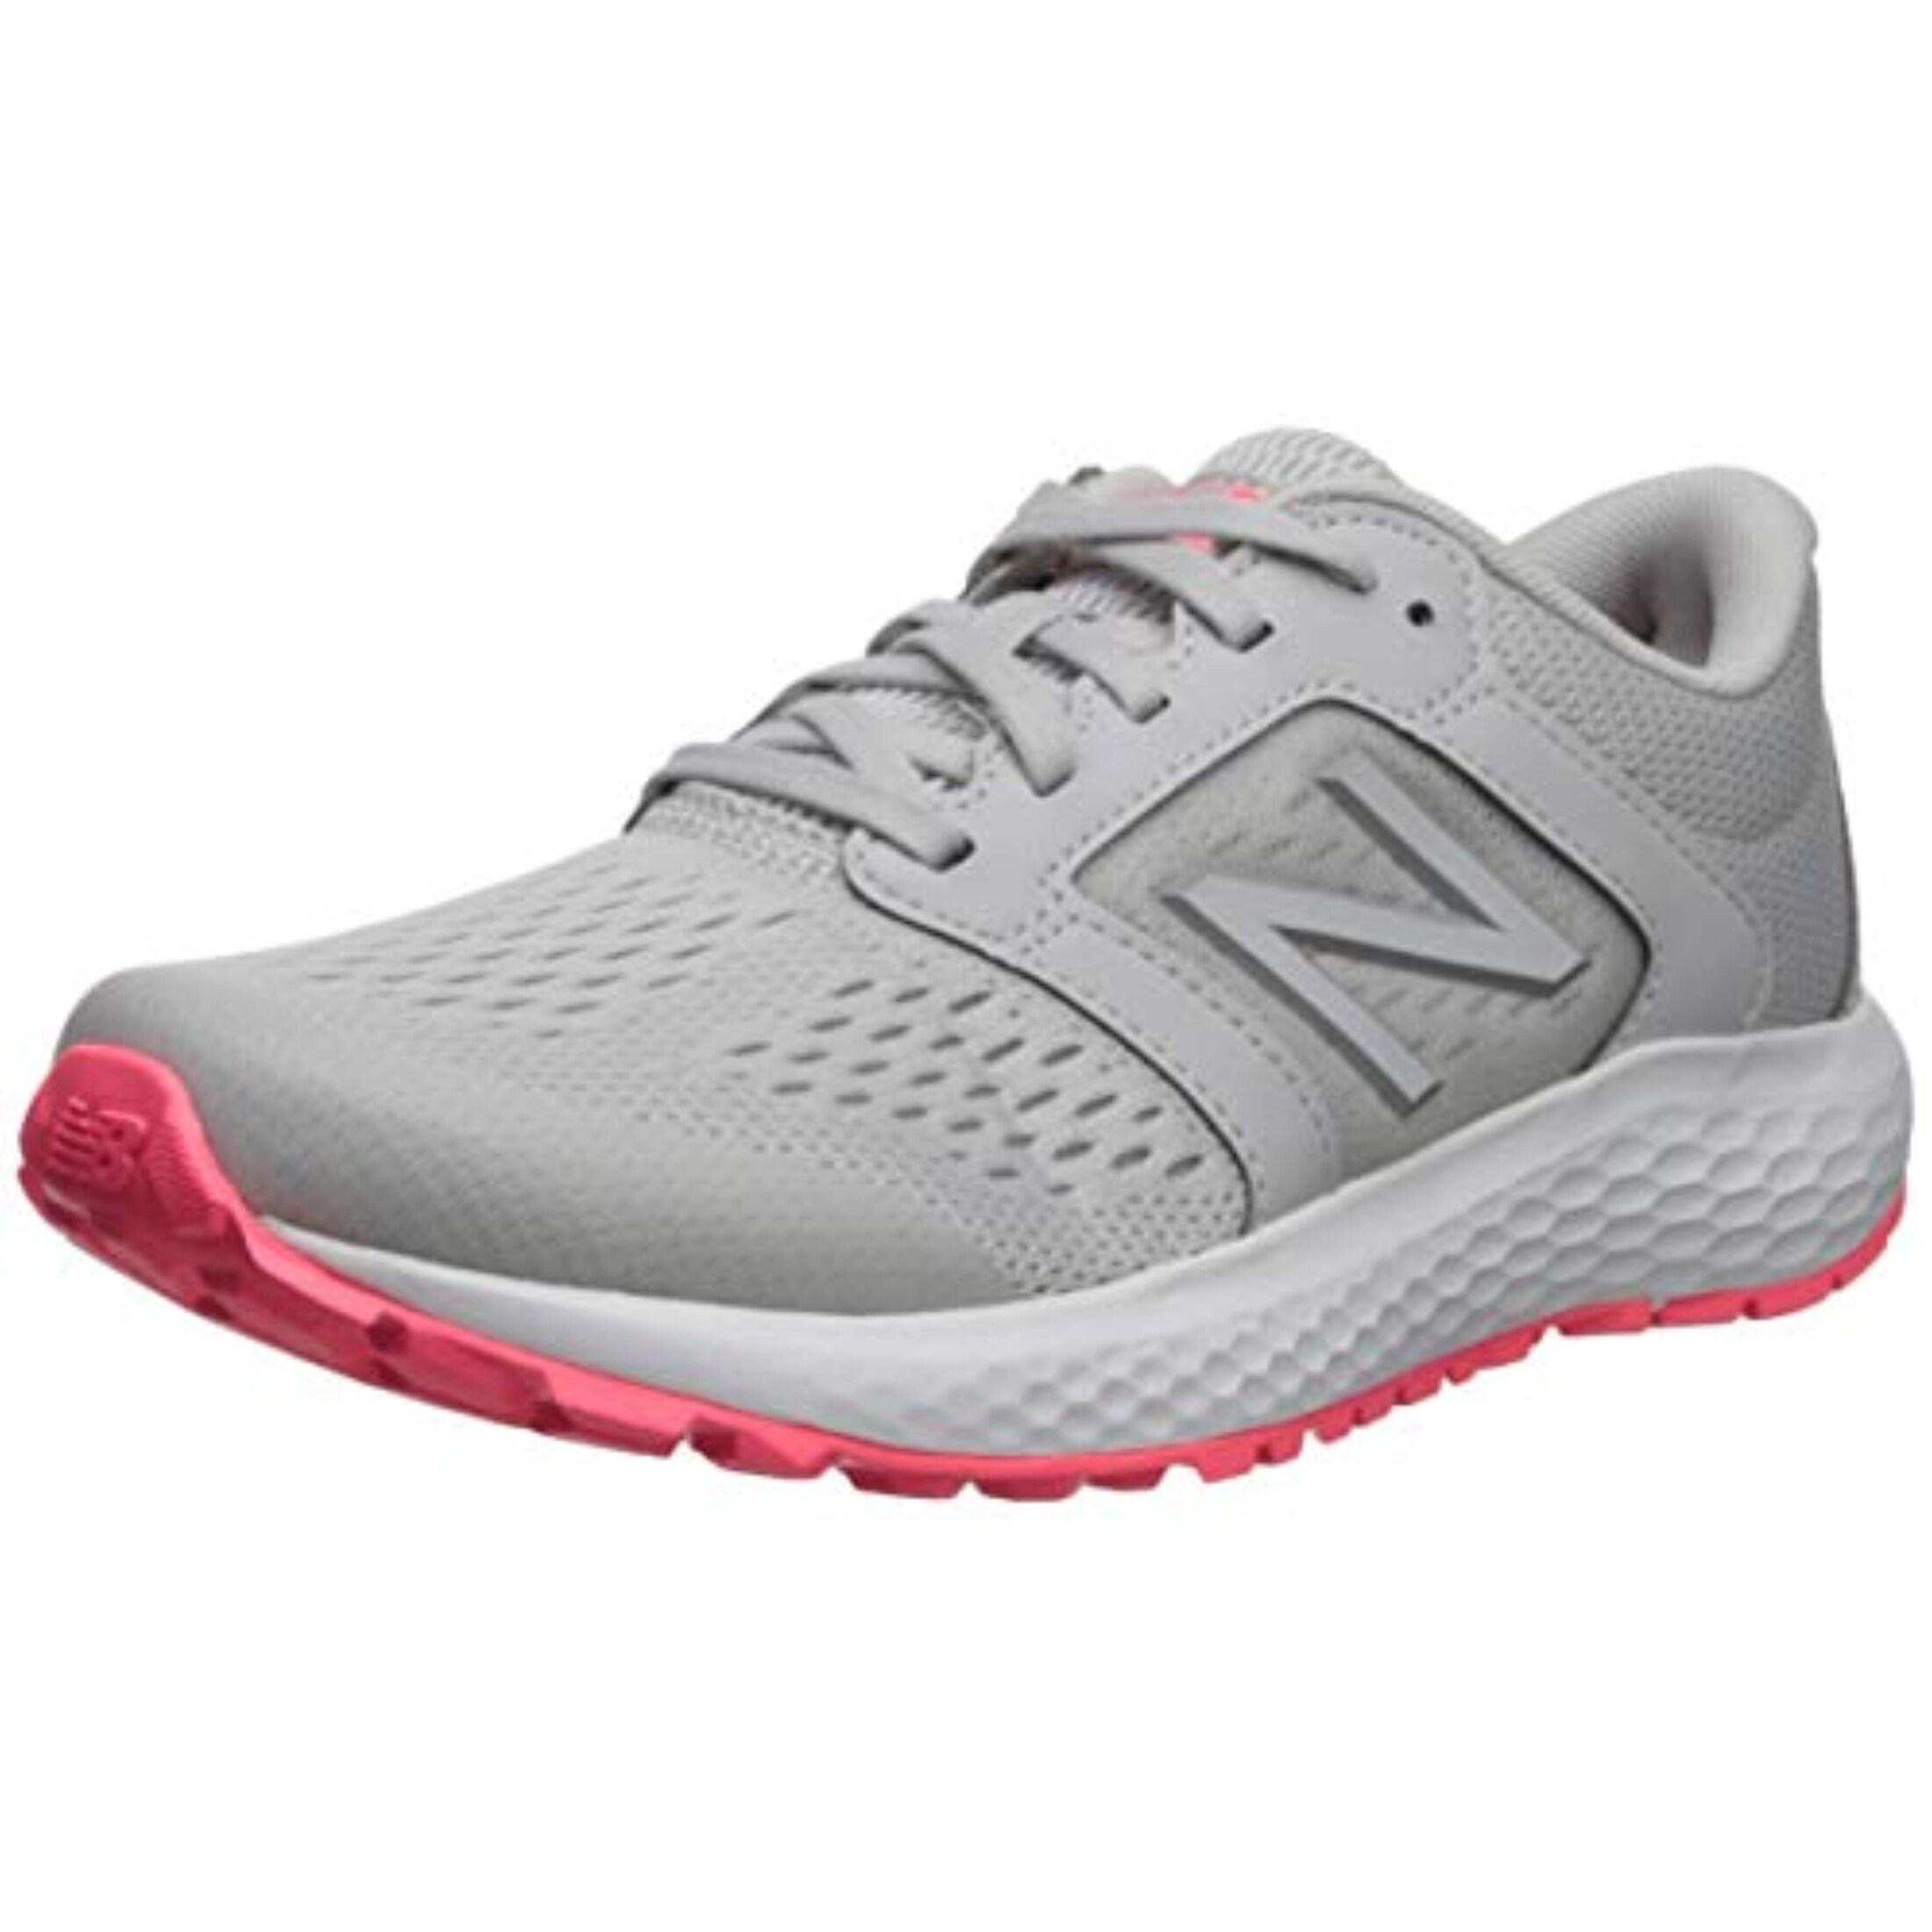 30529e495789 Size 10 New Balance Women s Shoes